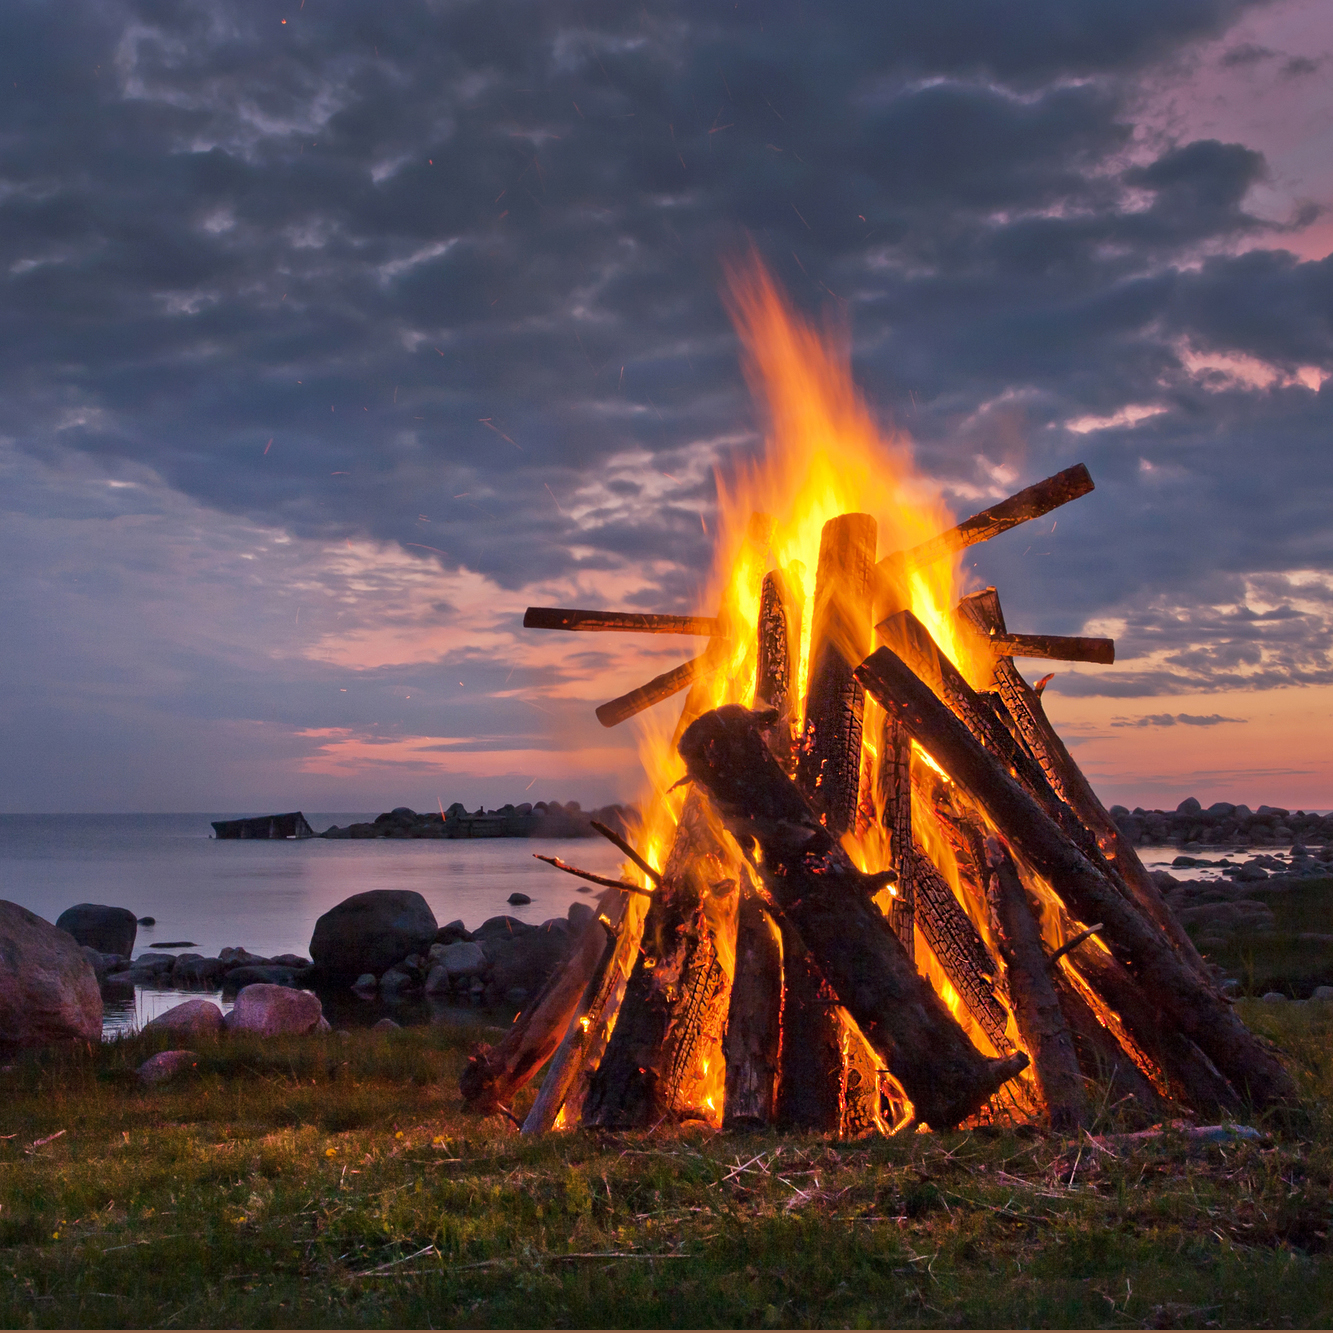 10 ideas How to host fun backyard bonfire parties via SIMPHOME.COM Featured Pinterest Image